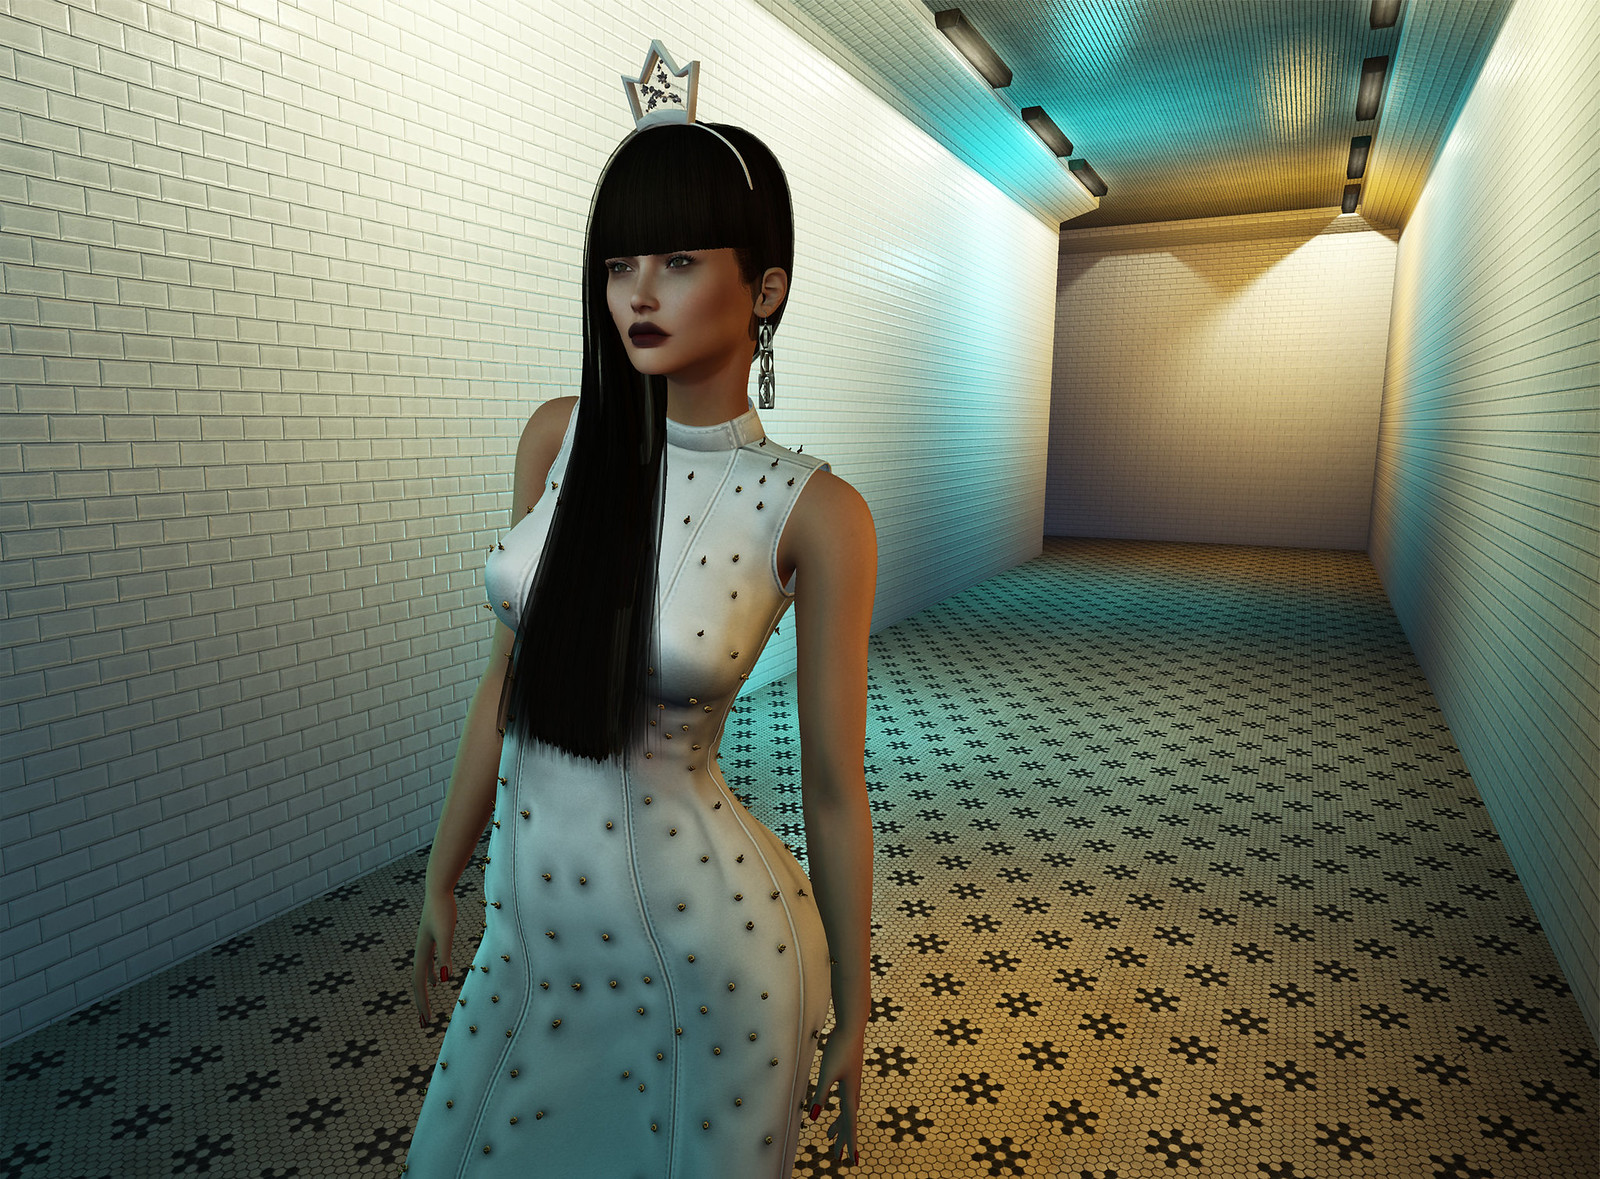 Yes, I'm a princess